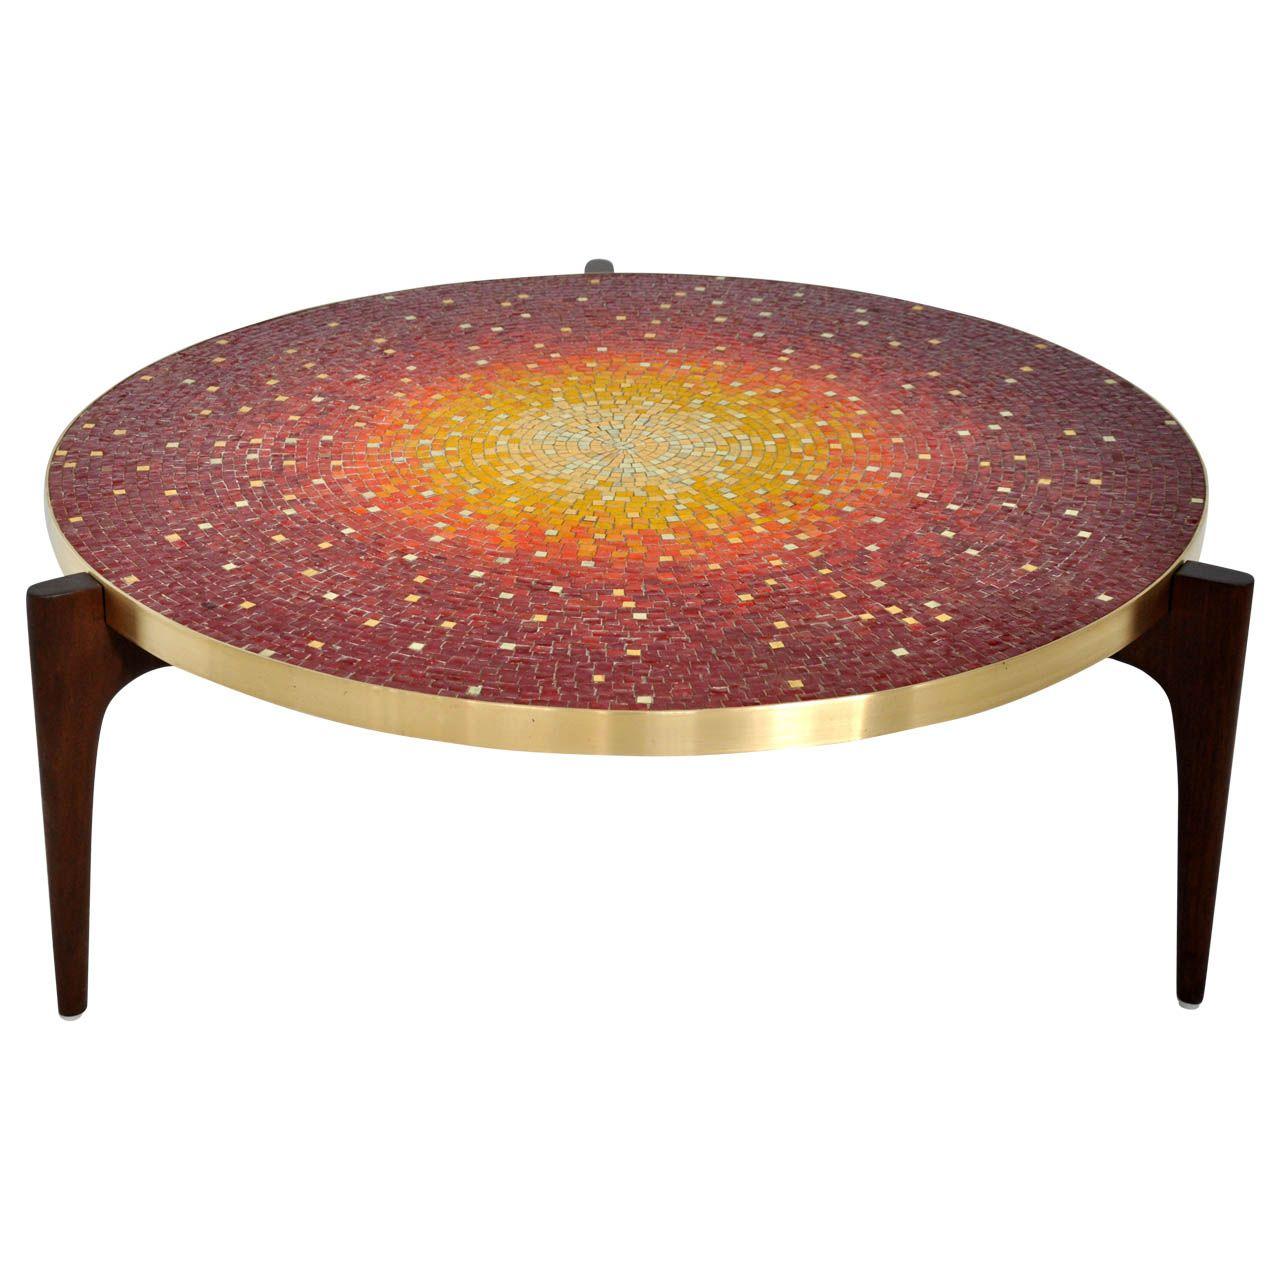 vladimir kagan mosaic coffee table brass band tables and mosaics